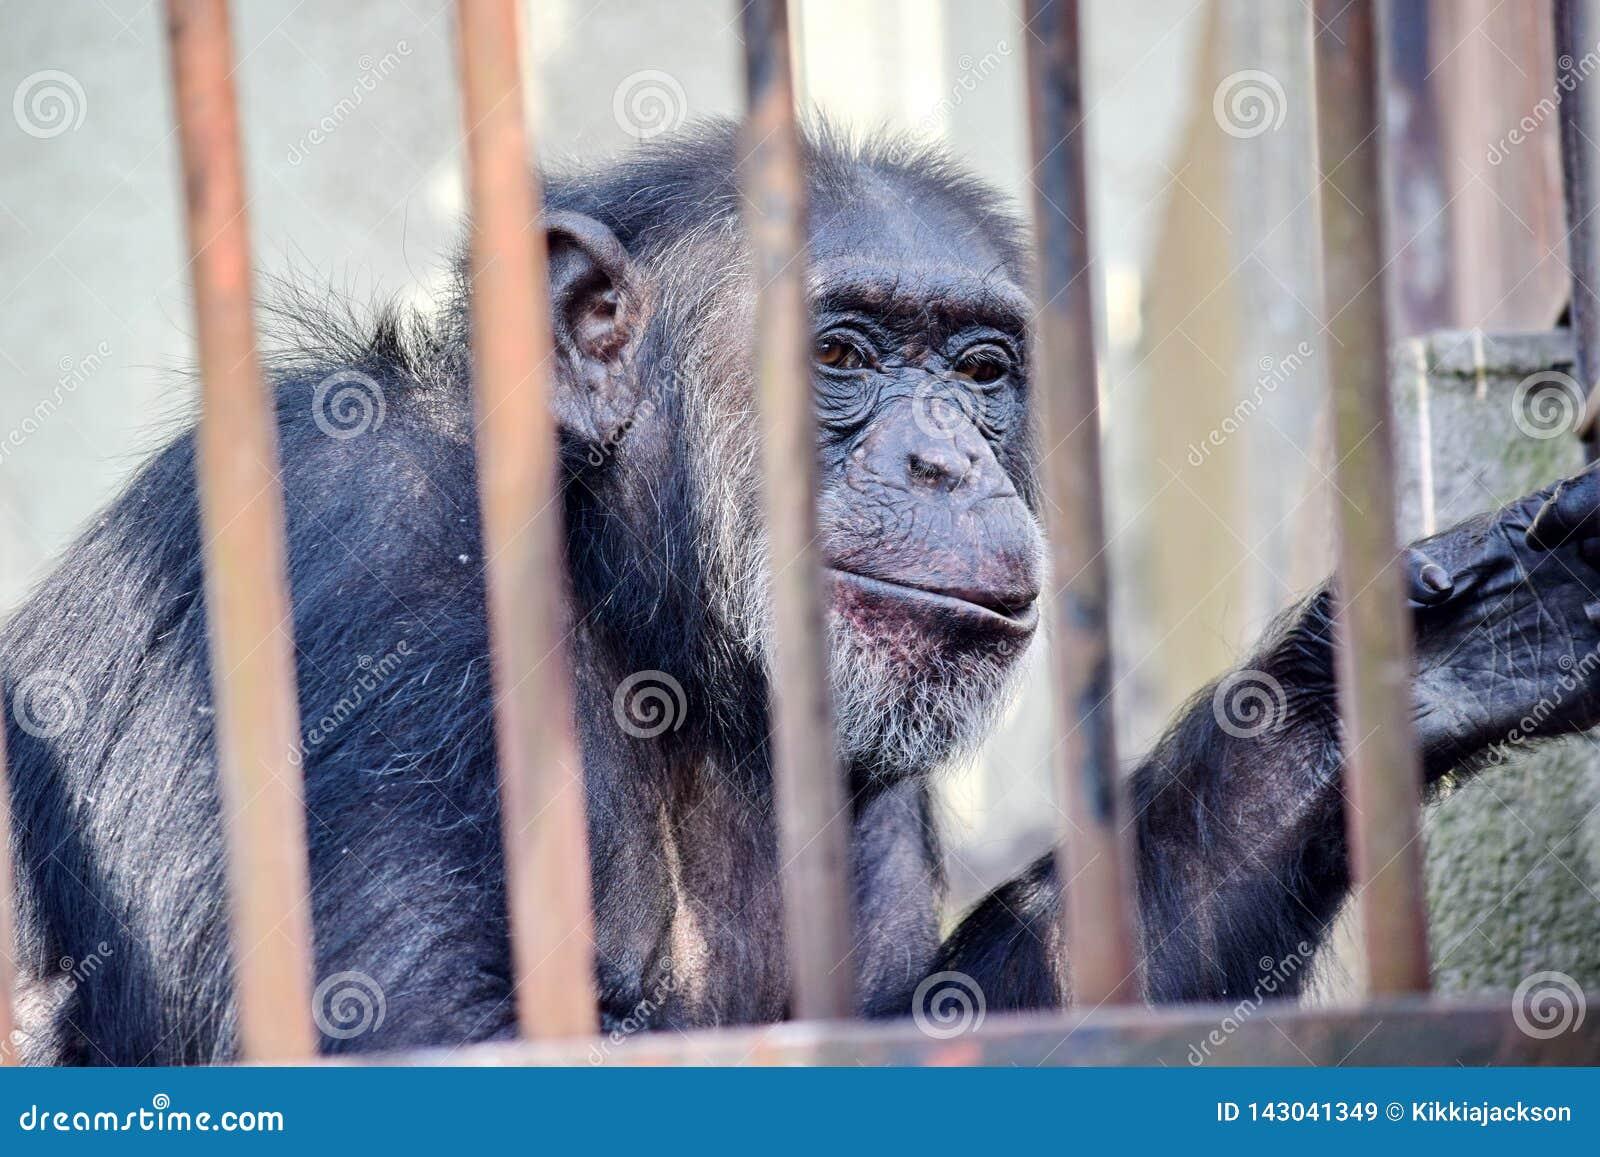 Chimpansee achter de Bars Pan Troglodytes San Monkey in Dierentuin zonder Ruimte